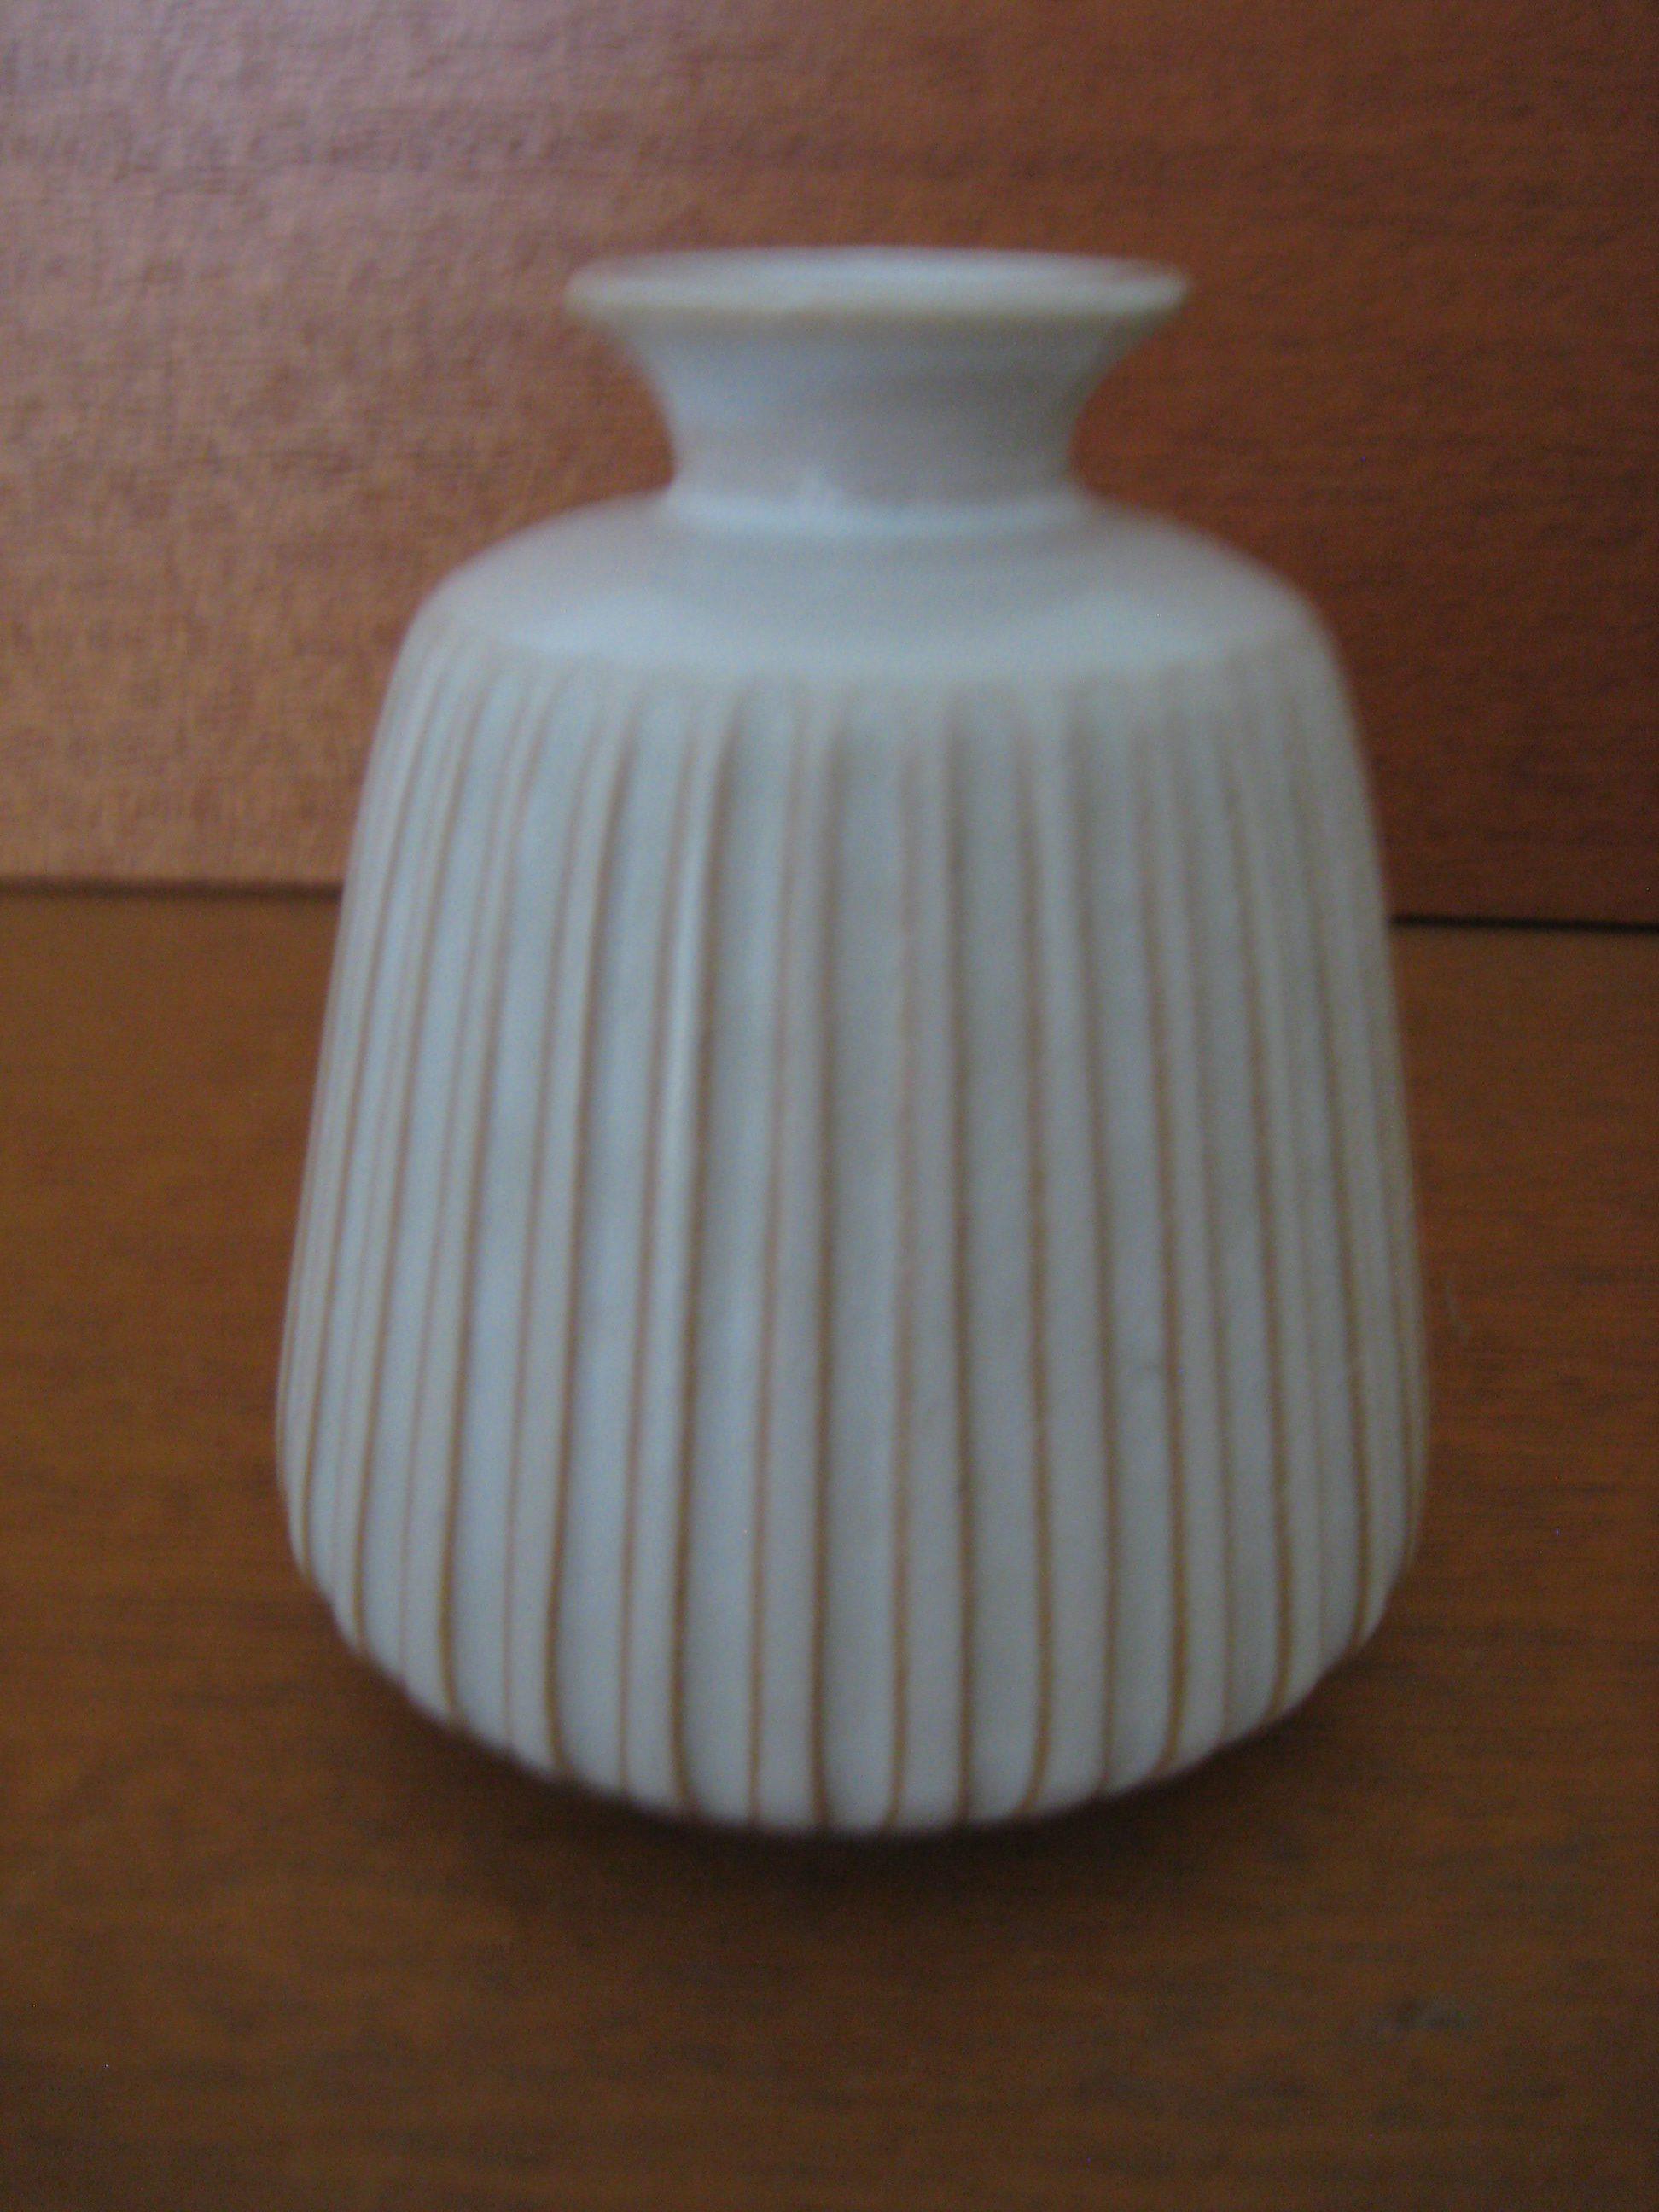 Arne Johansen, lille rillet vase